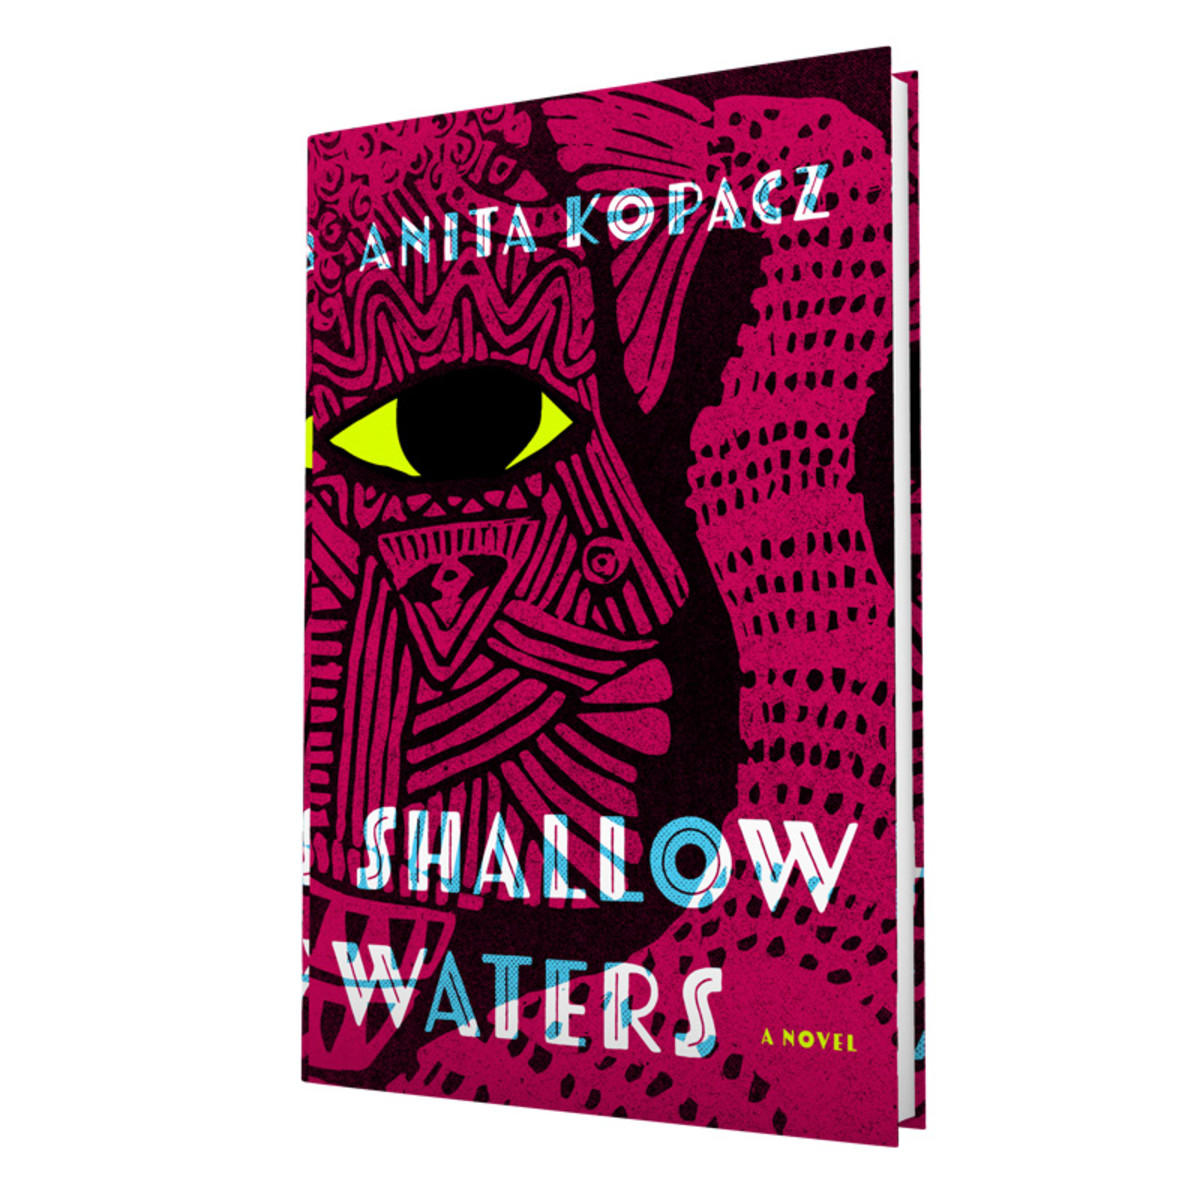 Anita Kopacz's SHALLOW WATERS